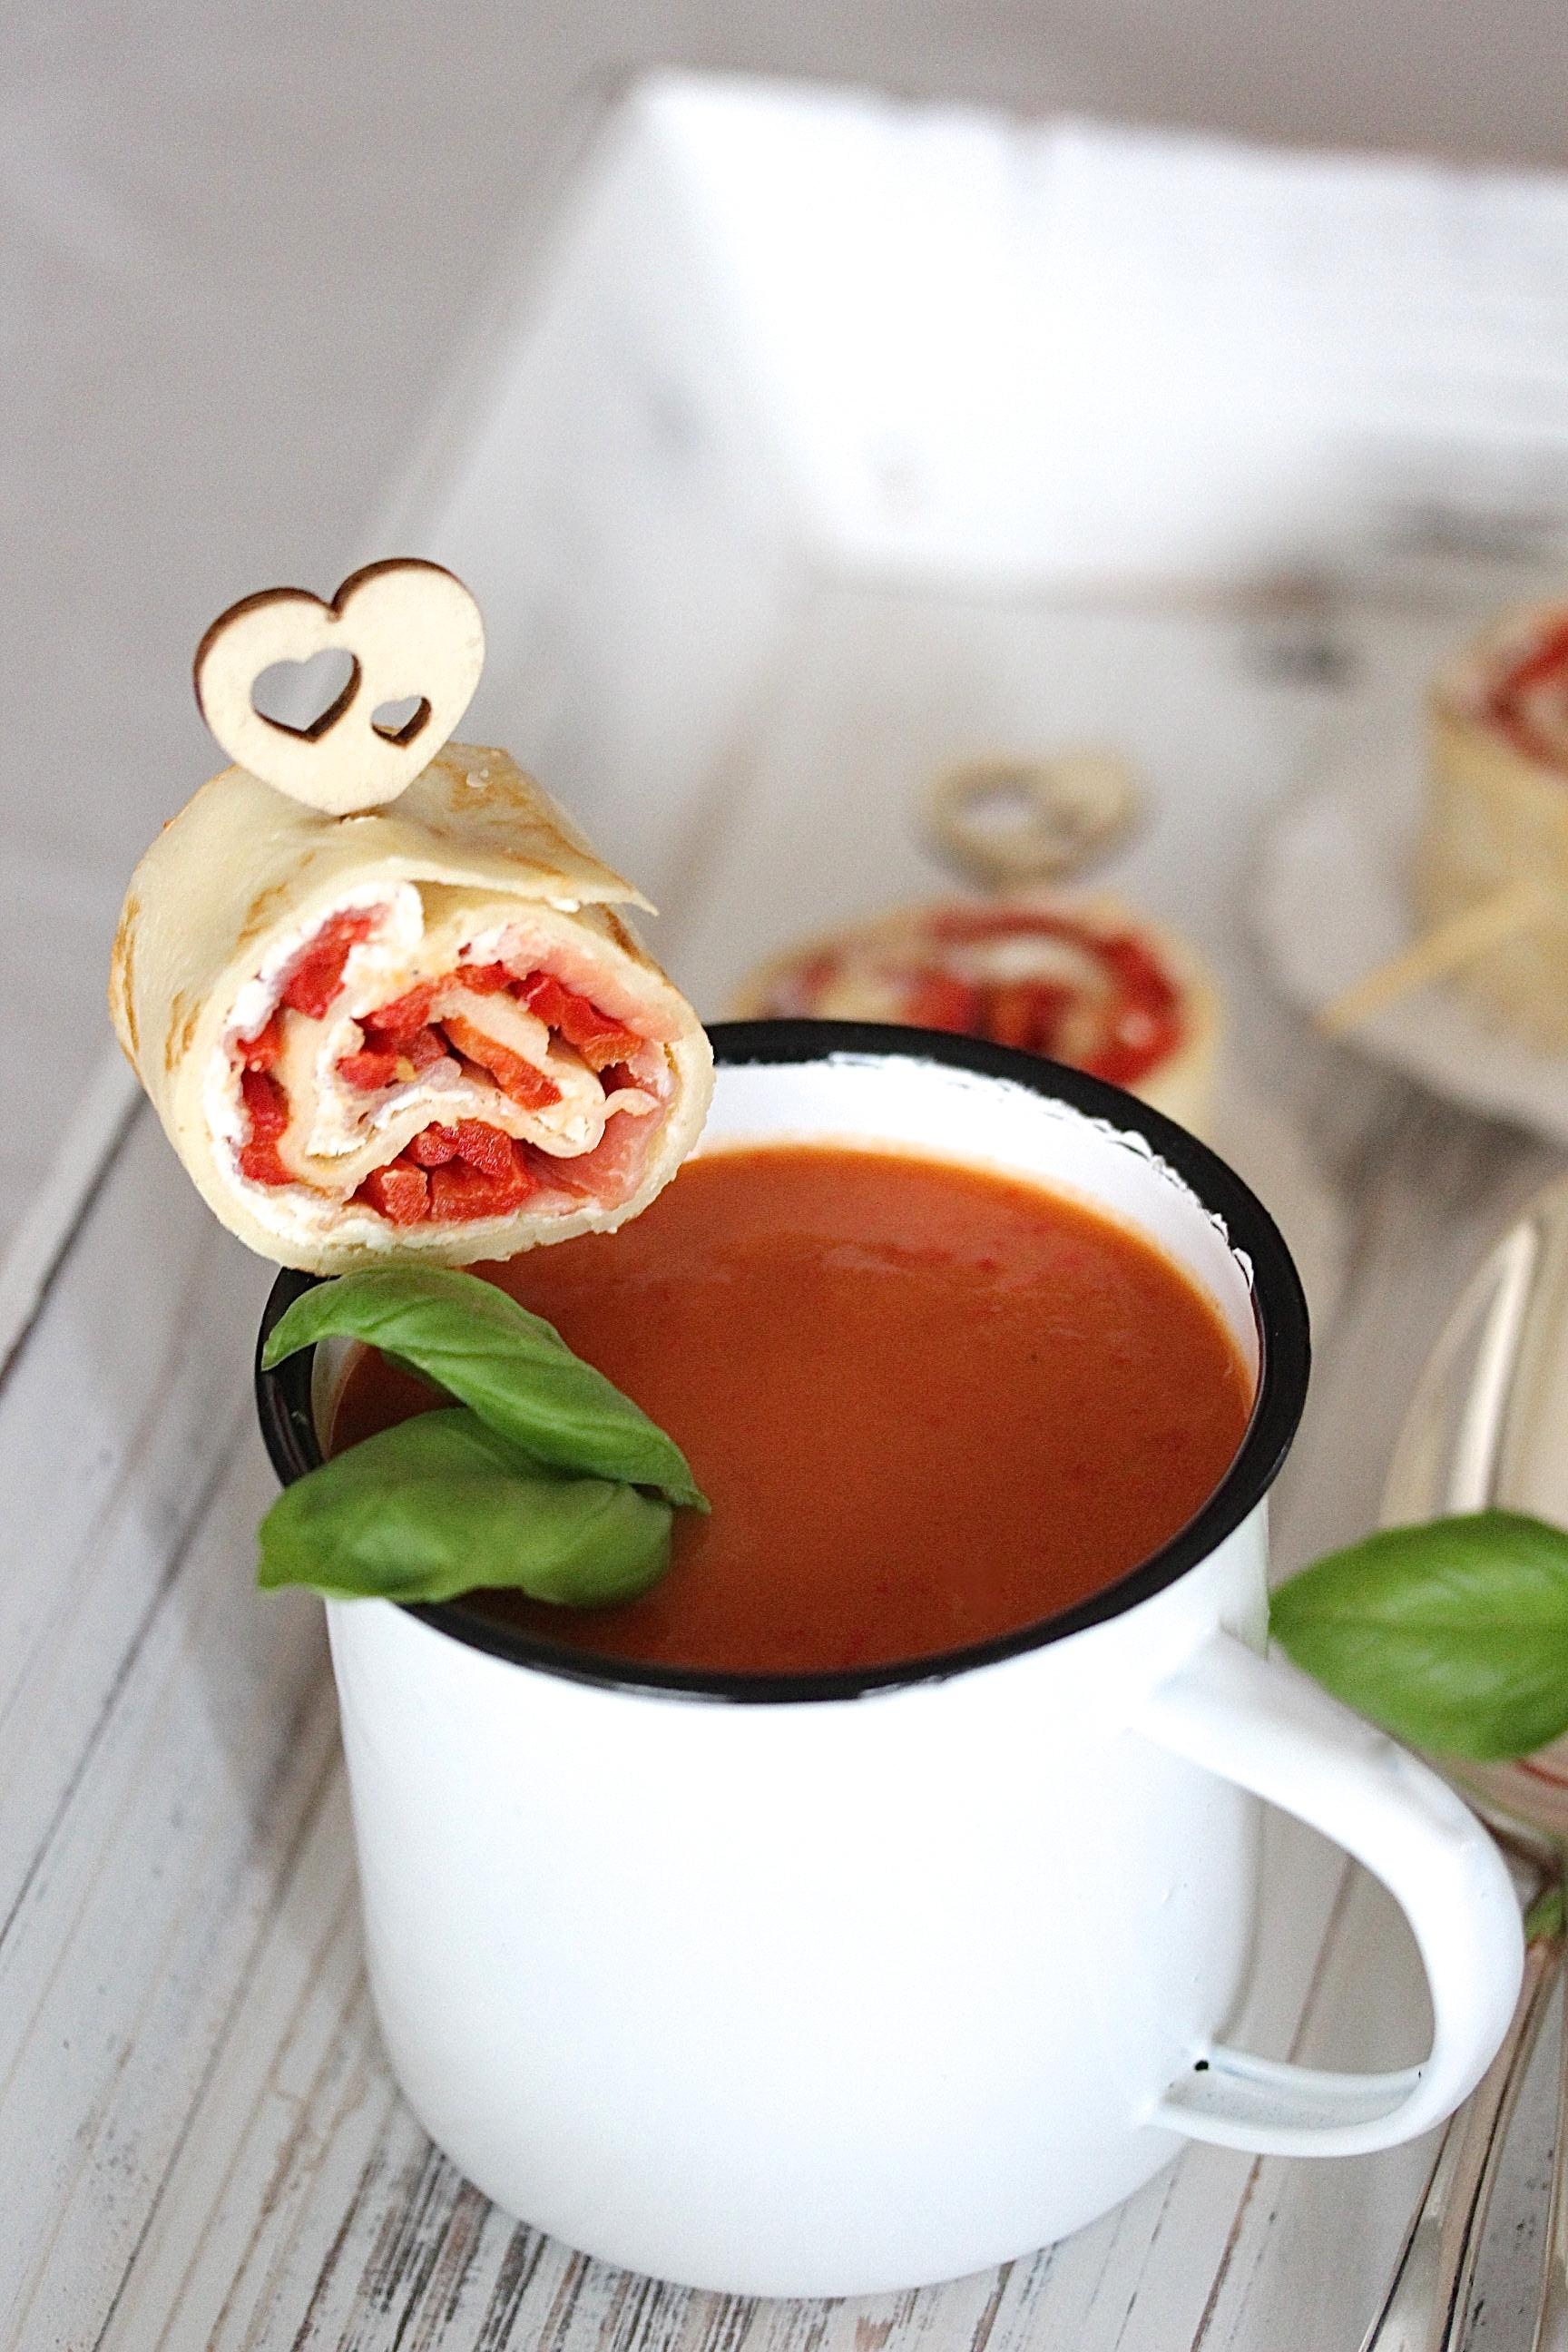 Paprika Creme Suppe Serrano Persam Schinken Crepe Röllchen Rezept zum Osterbrunch Ostern kochen #ostern #suppe | Emma´s Lieblingsstücke